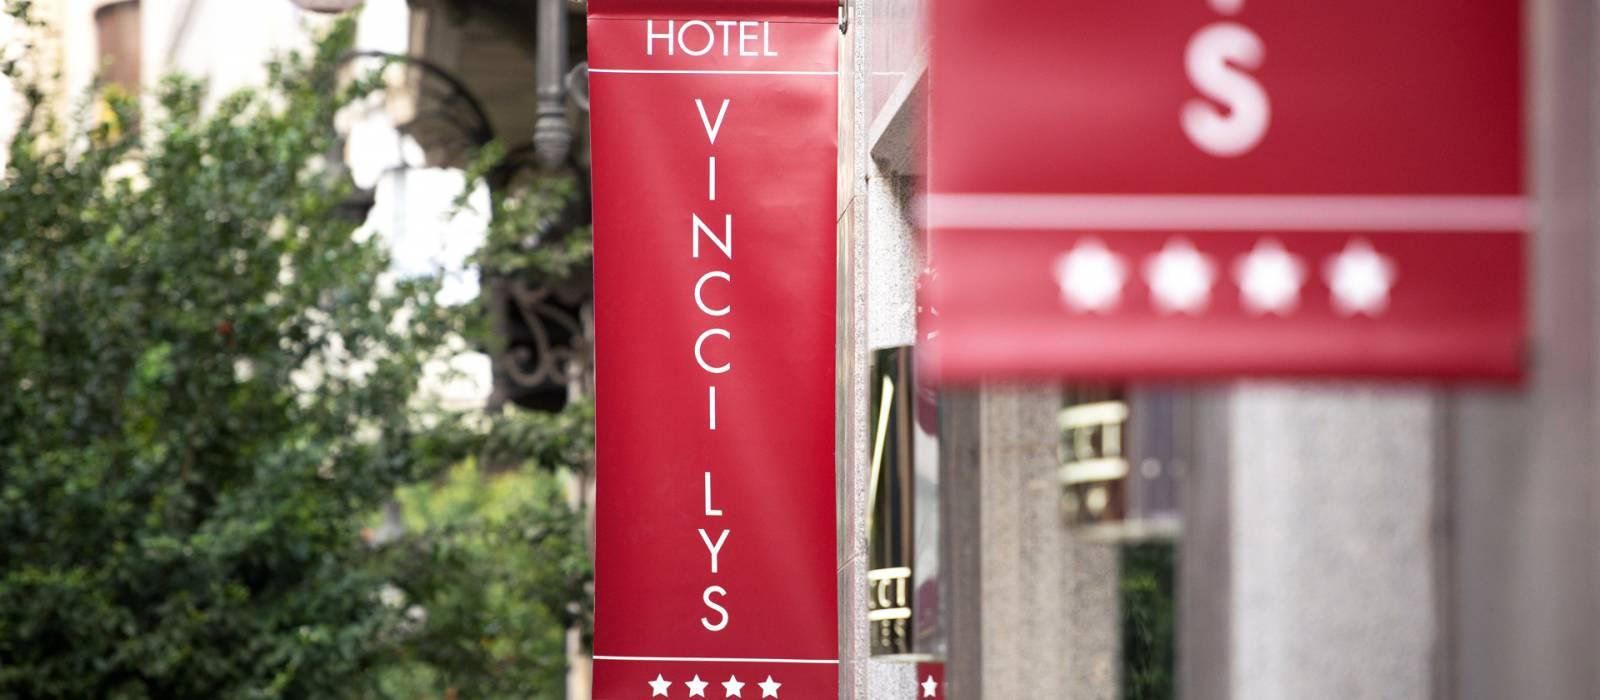 Fassade - Vincci Lys 4*